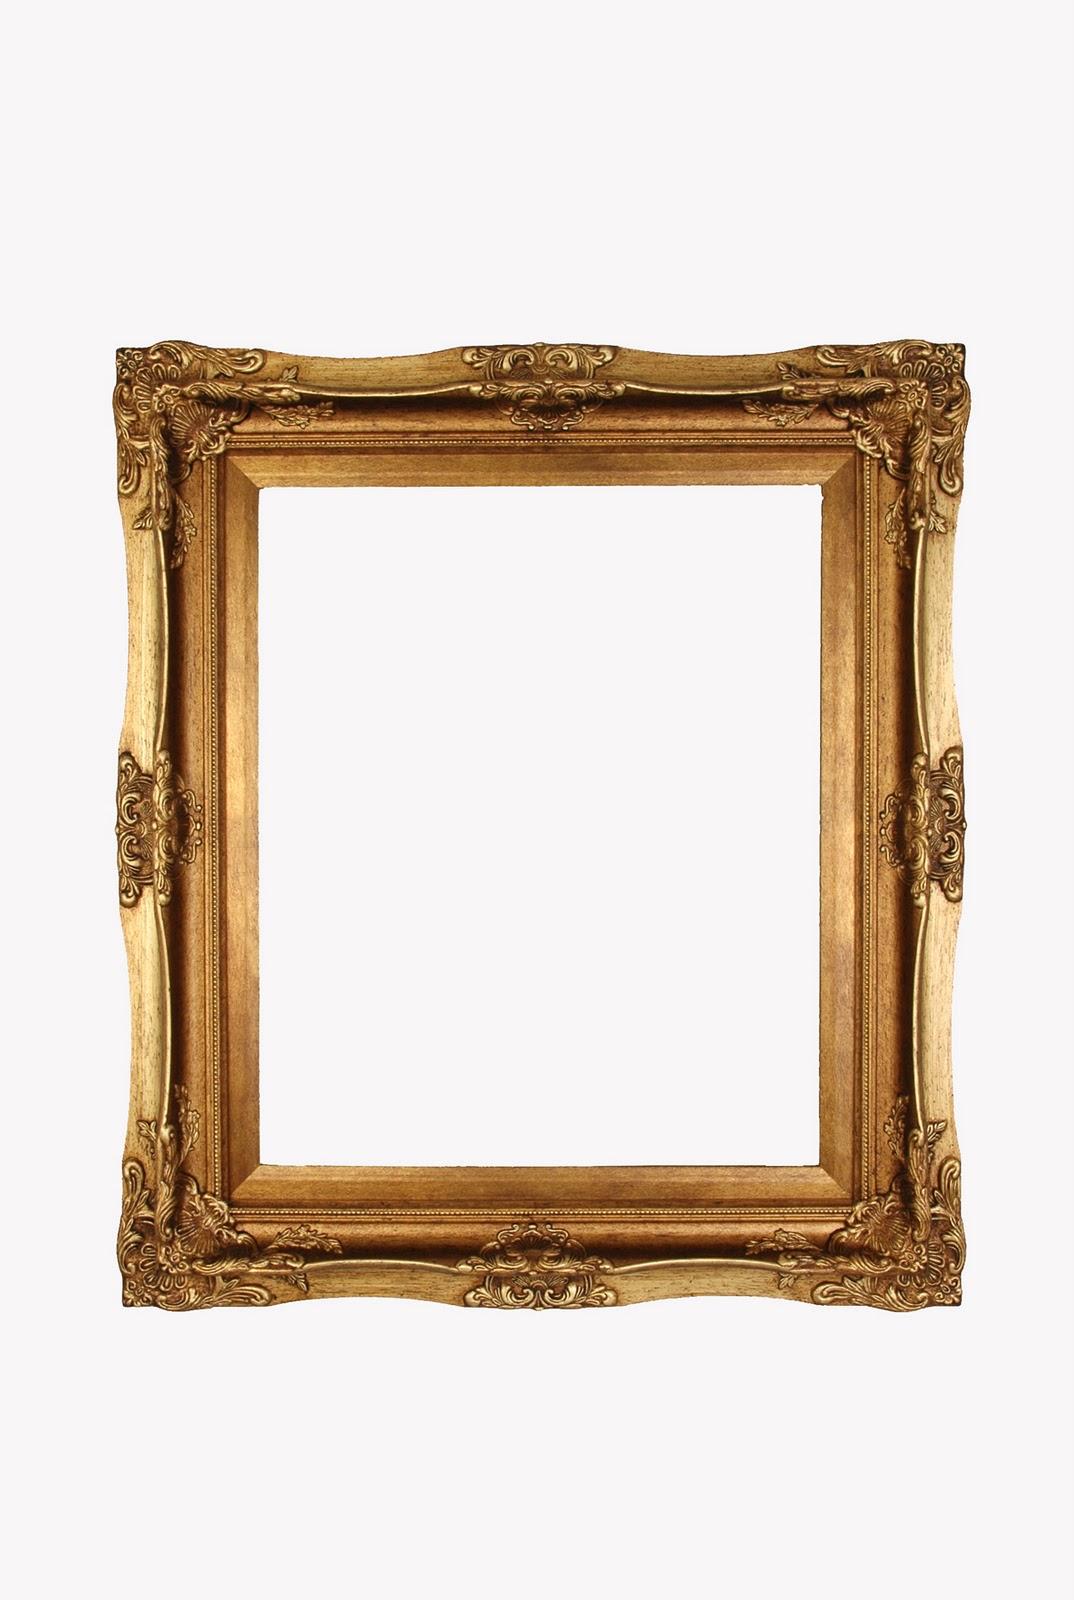 Bingkai kayu KP 77 N-21,lbr profil 6,5 cm